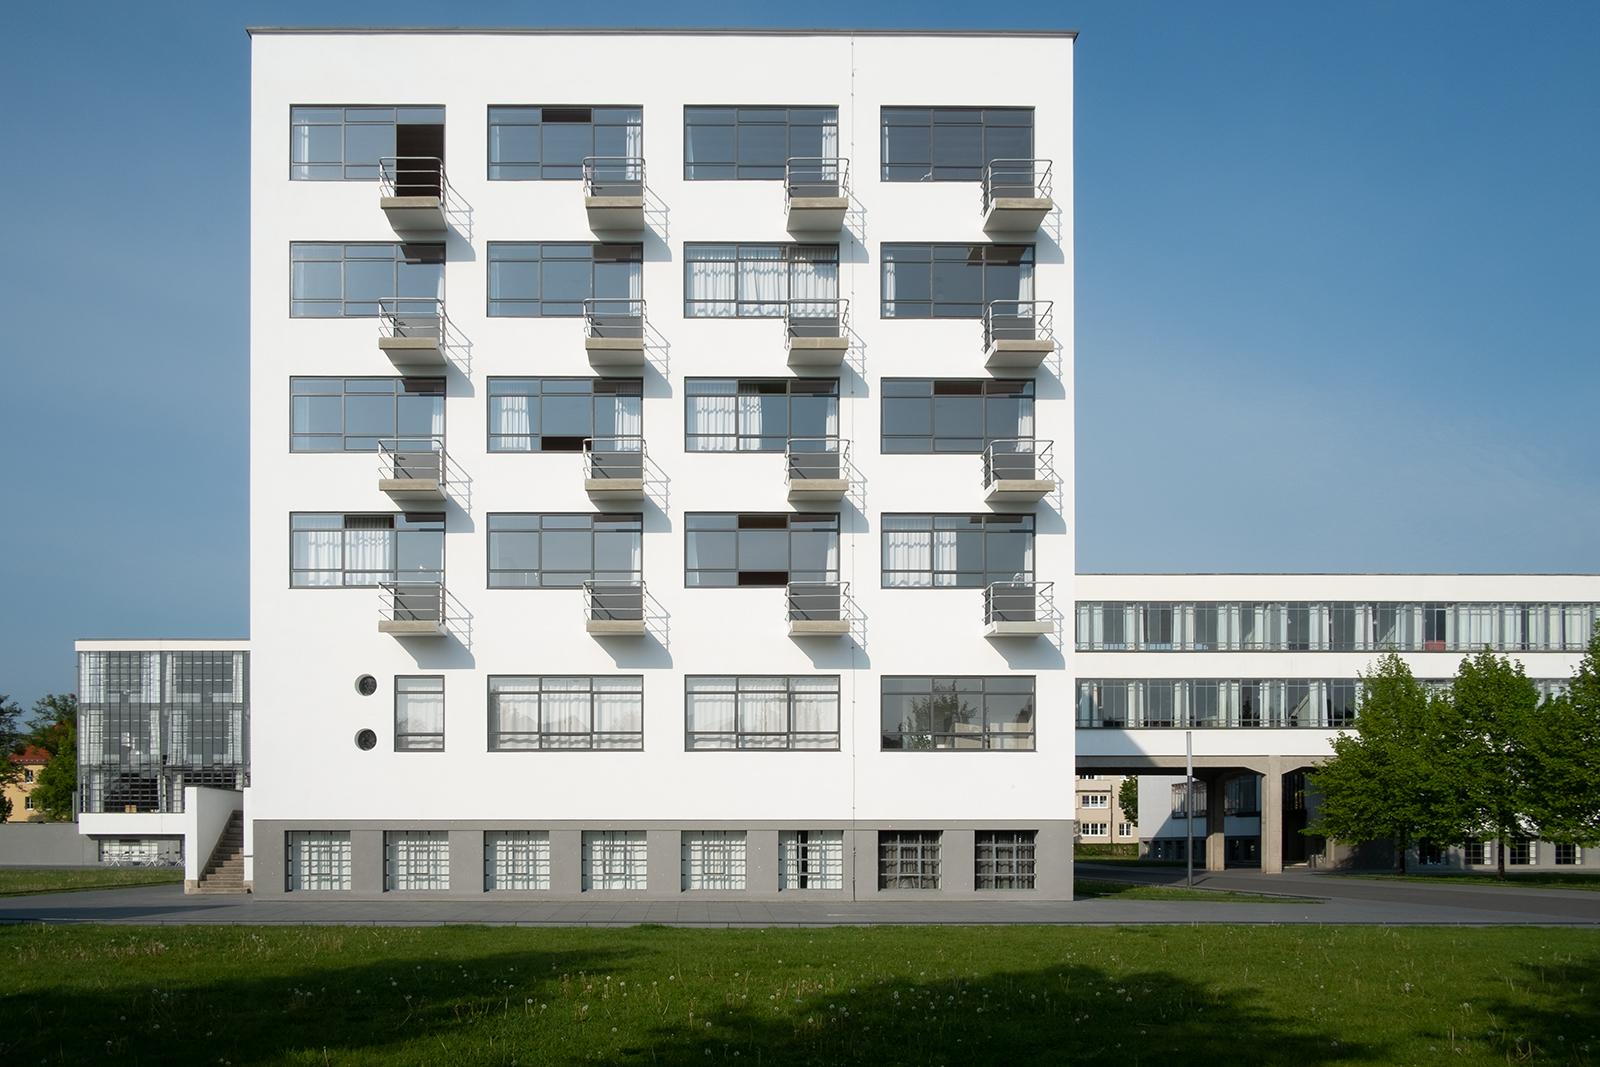 Bauhaus Dorms in Dessau, Germany